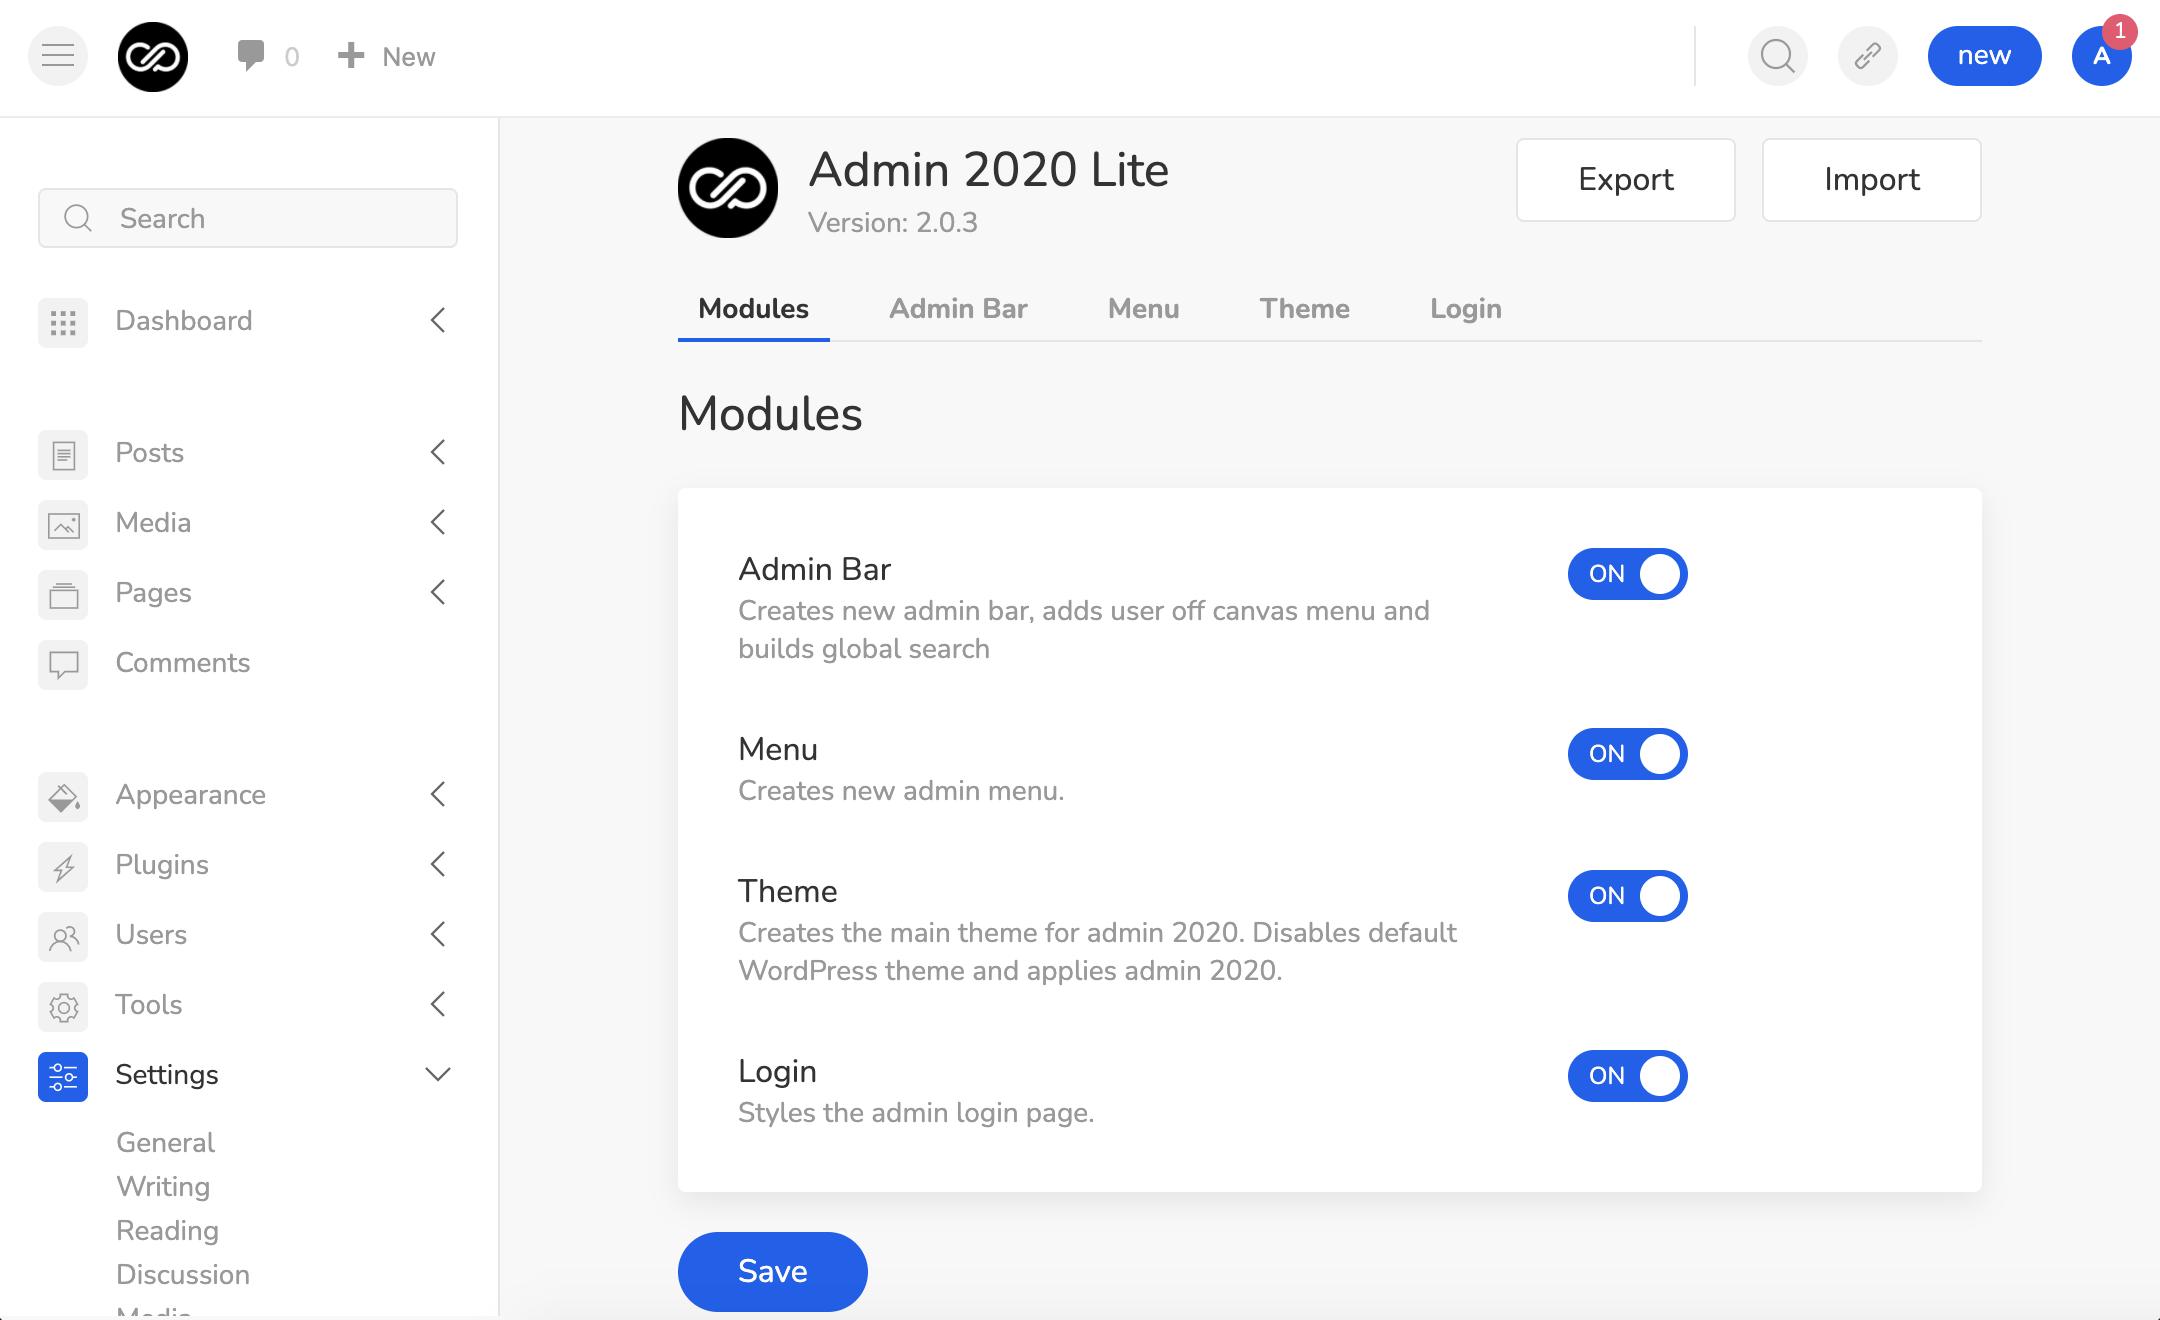 admin-2020-version-2-引入新的精简版-更好的插件-兼容性和模块化体系结构-1 Admin 2020第2版引入了新的Lite版本,更好的插件兼容性和模块化体系结构